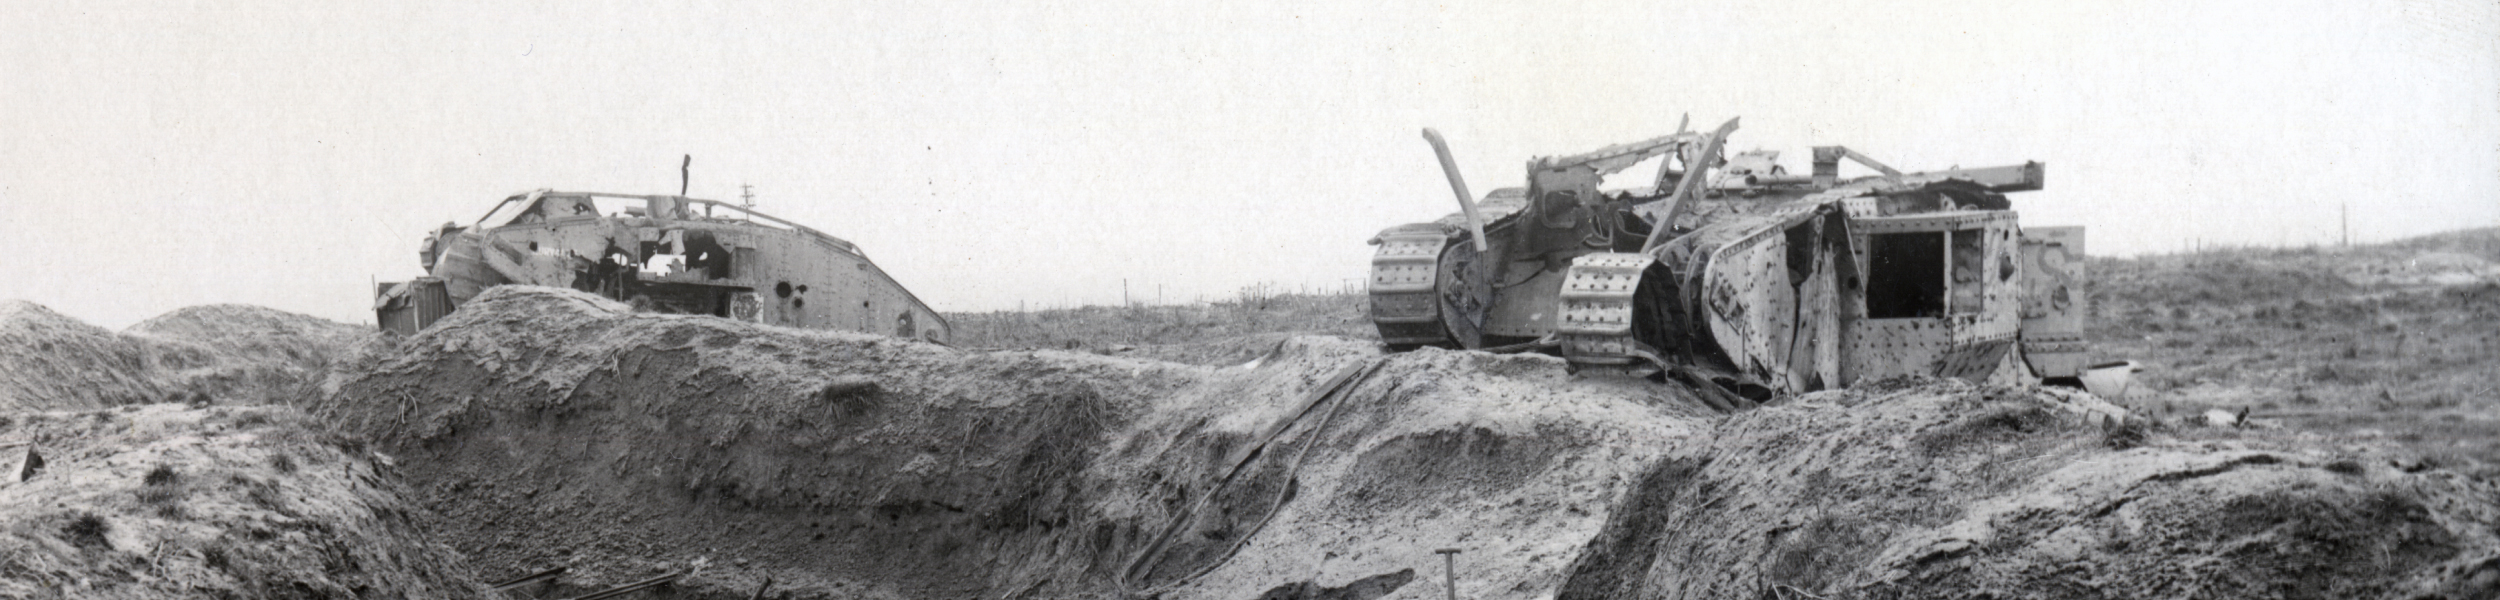 LH3-34-186-Tanks